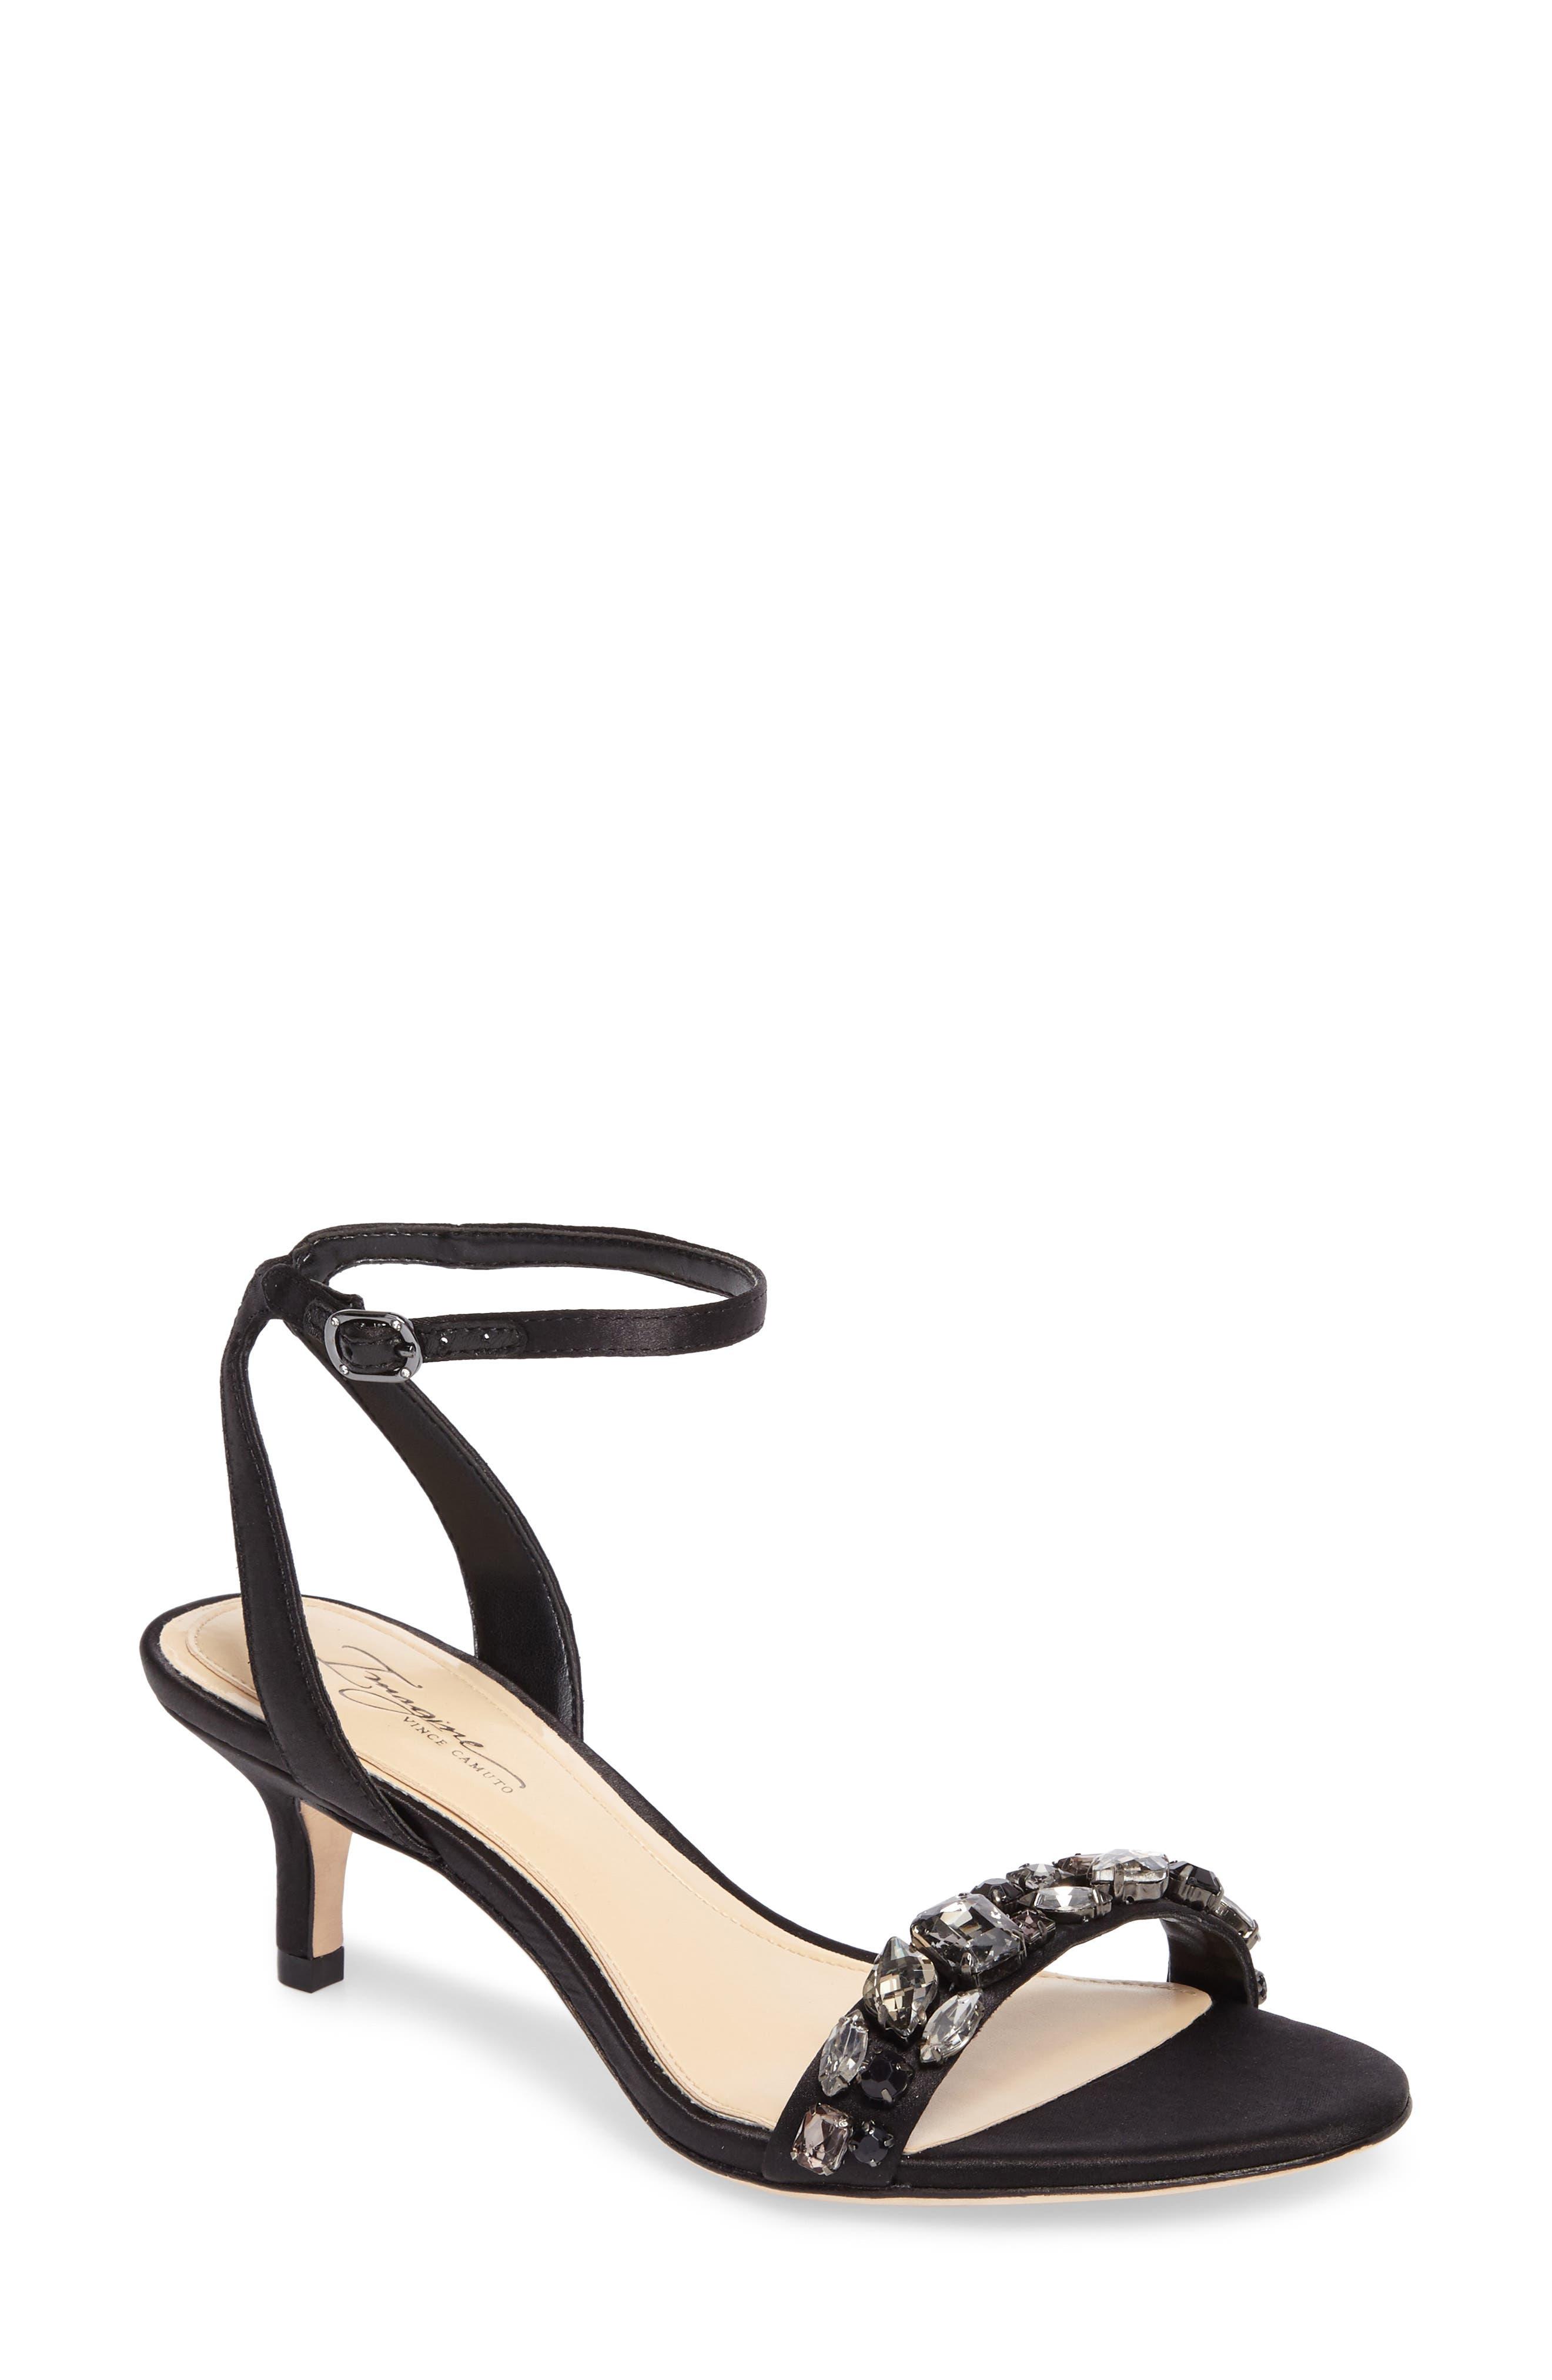 Main Image - Imagine Vince Camuto Kolo Embellished Kitten Heel Sandal (Women)